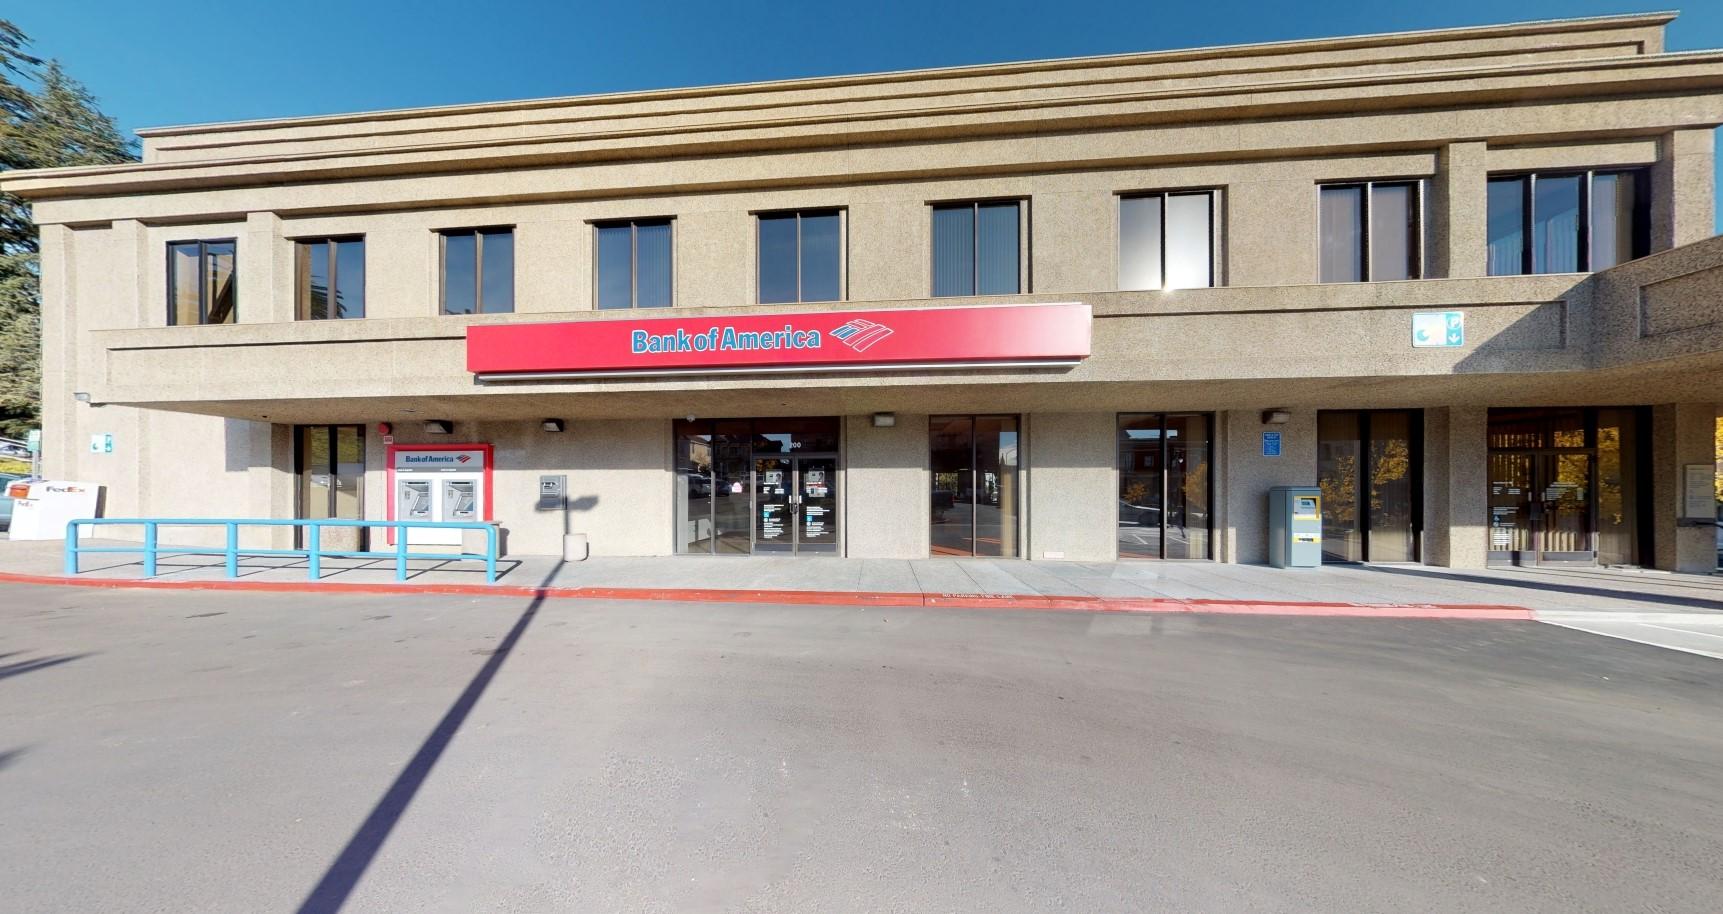 Bank of America financial center with walk-up ATM | 200 Kentucky St, Petaluma, CA 94952